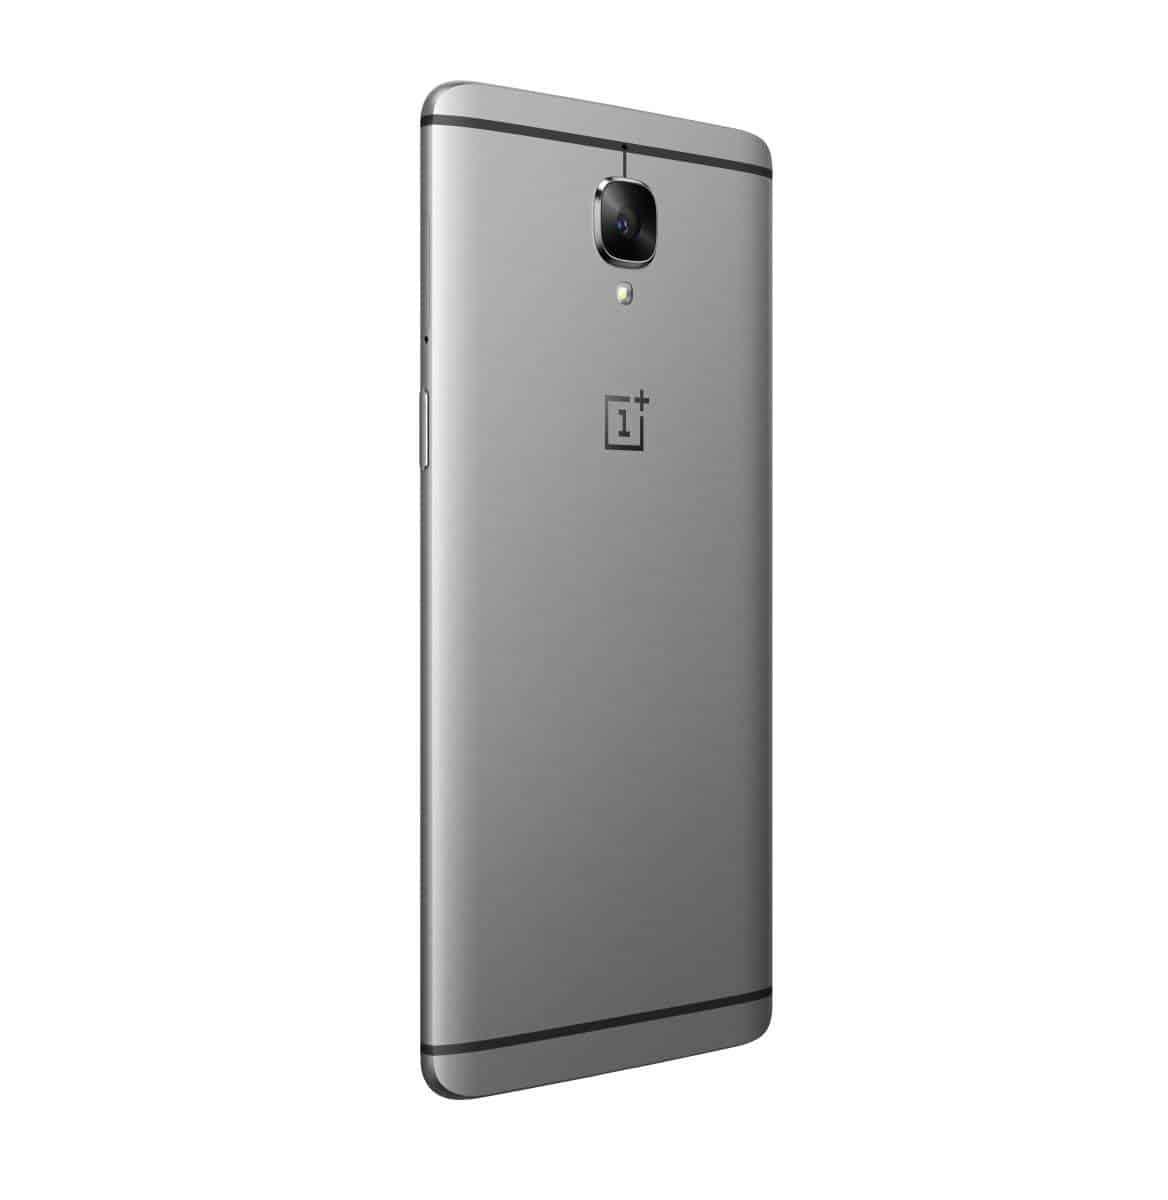 OnePlus 3 Graphite Press AH 6